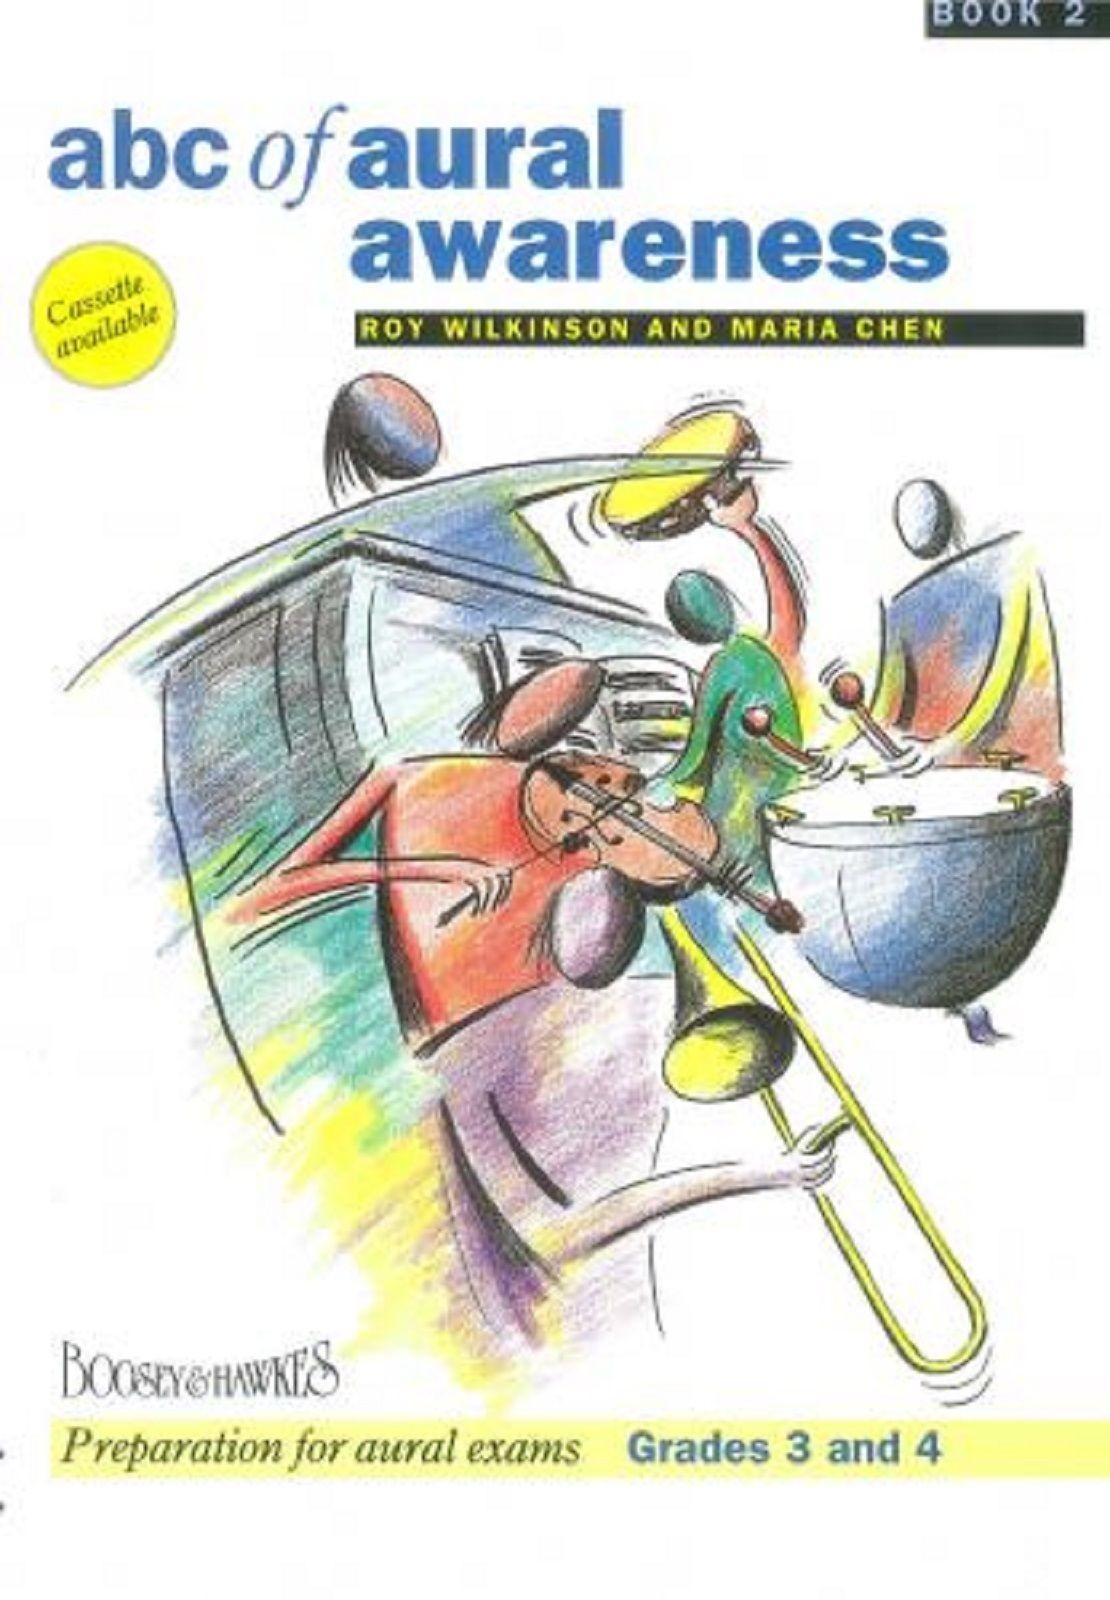 ABC Of Aural Awareness Book 2 Grades 3-4 Preparation Exam Theory  Book S169